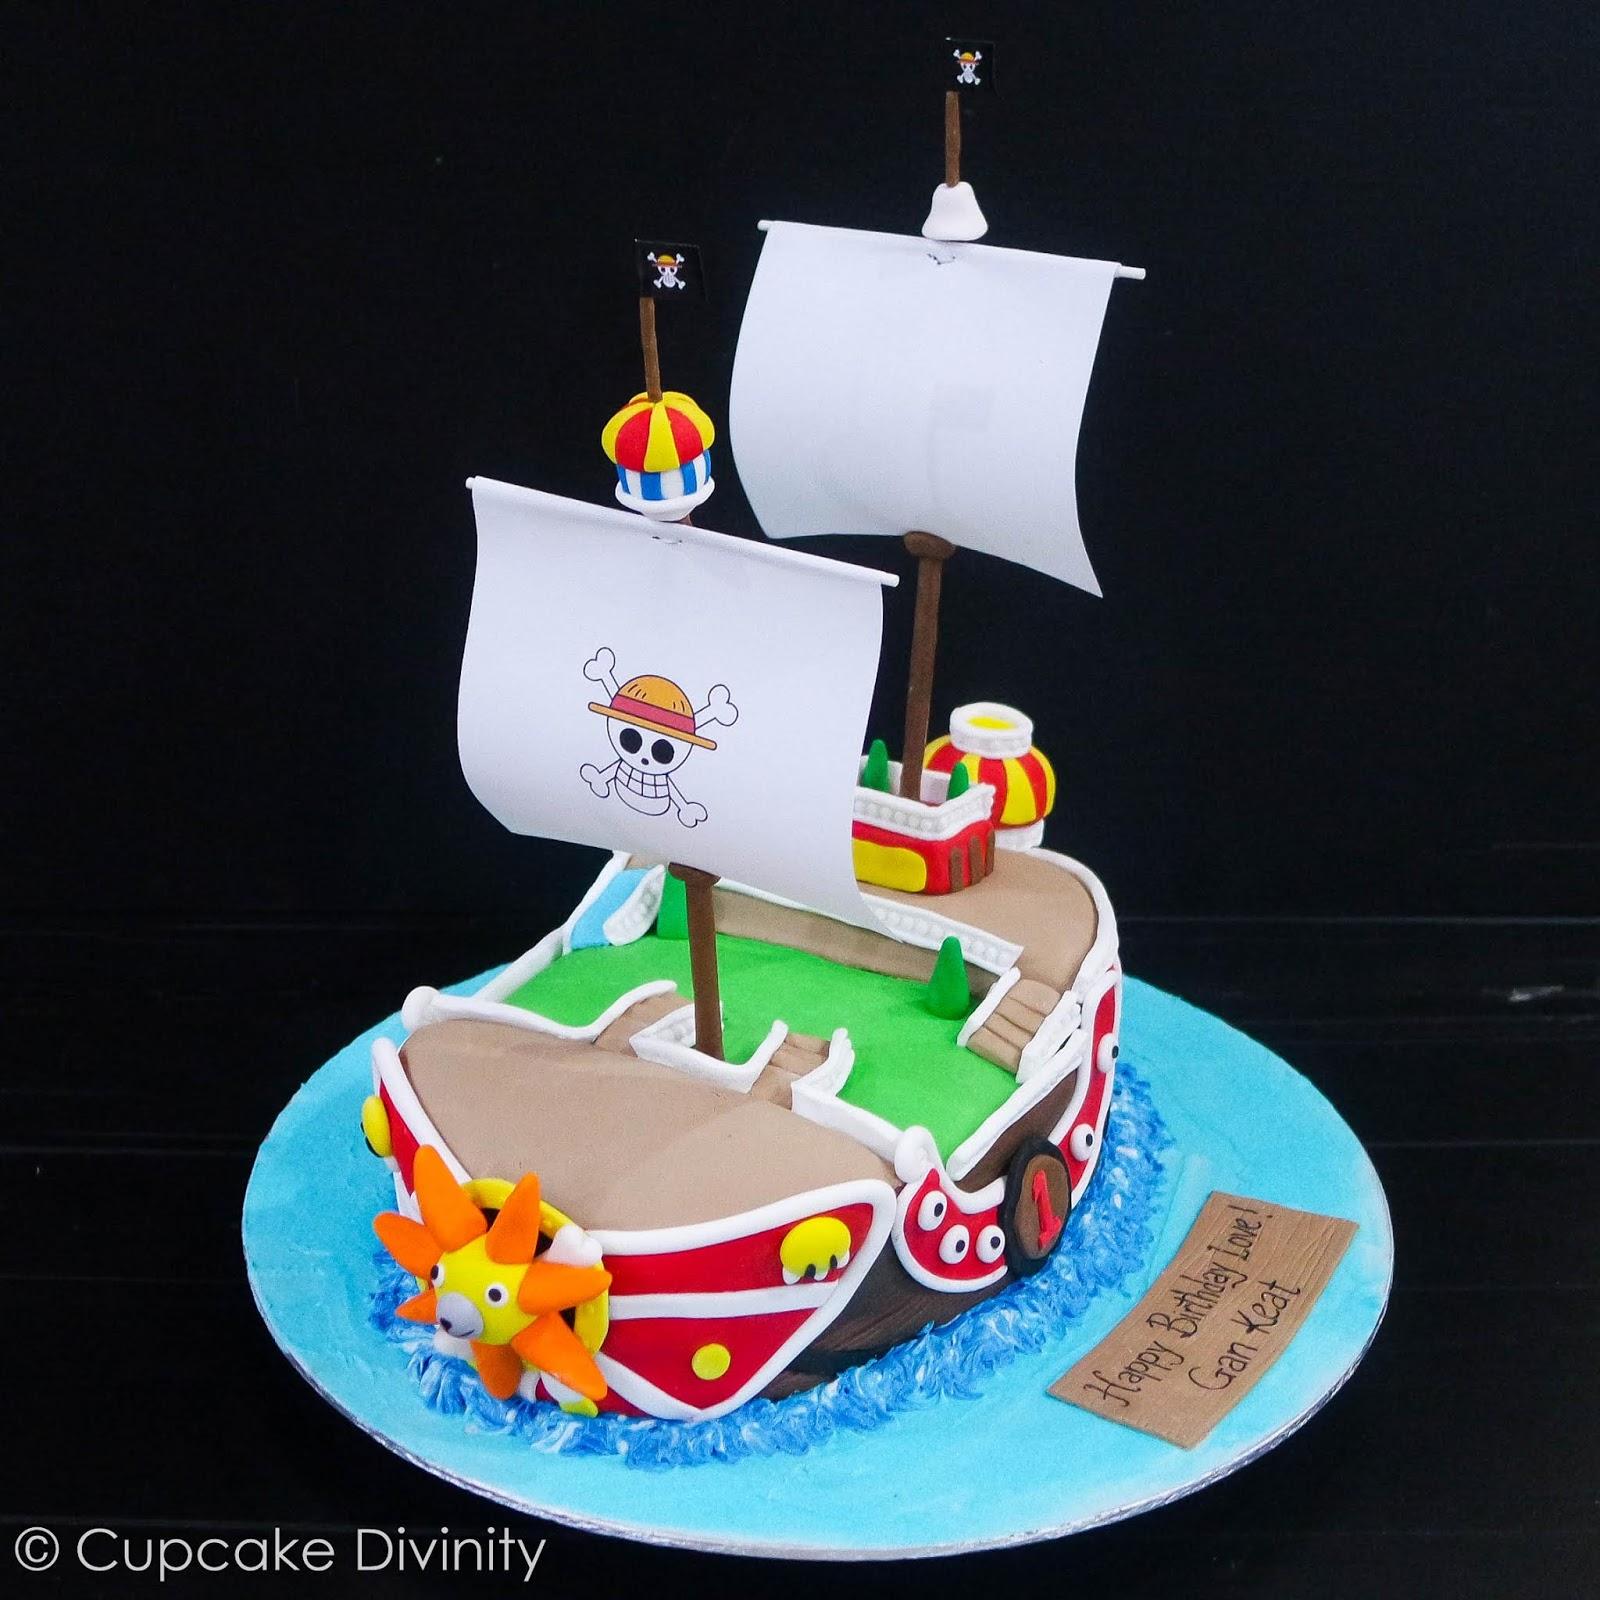 Cupcake Divinity One Piece Ship Cake